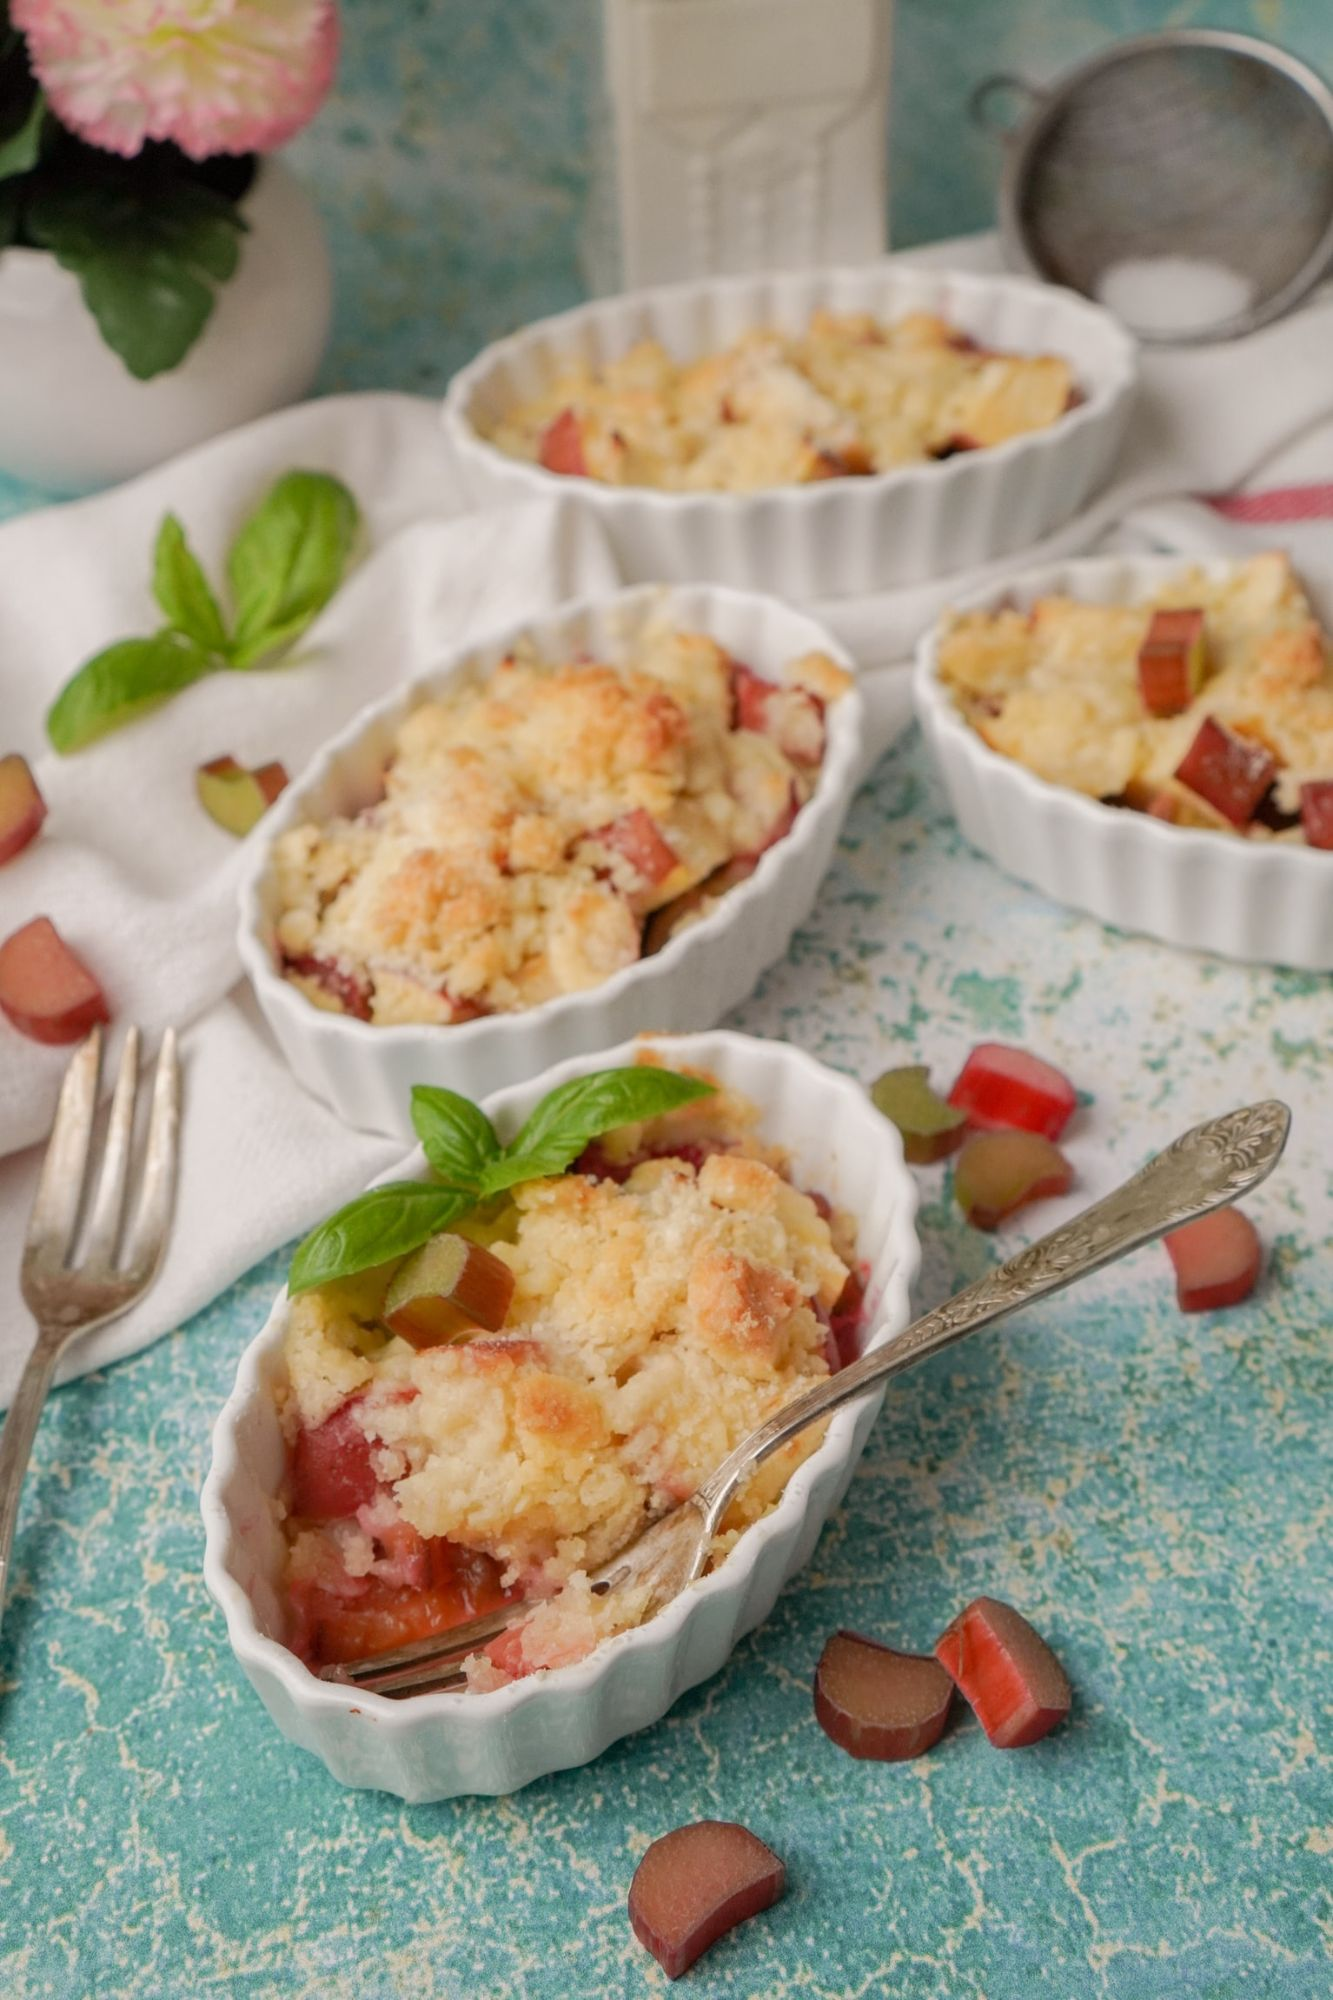 Rhubarb and Ginger Crumble Recipe